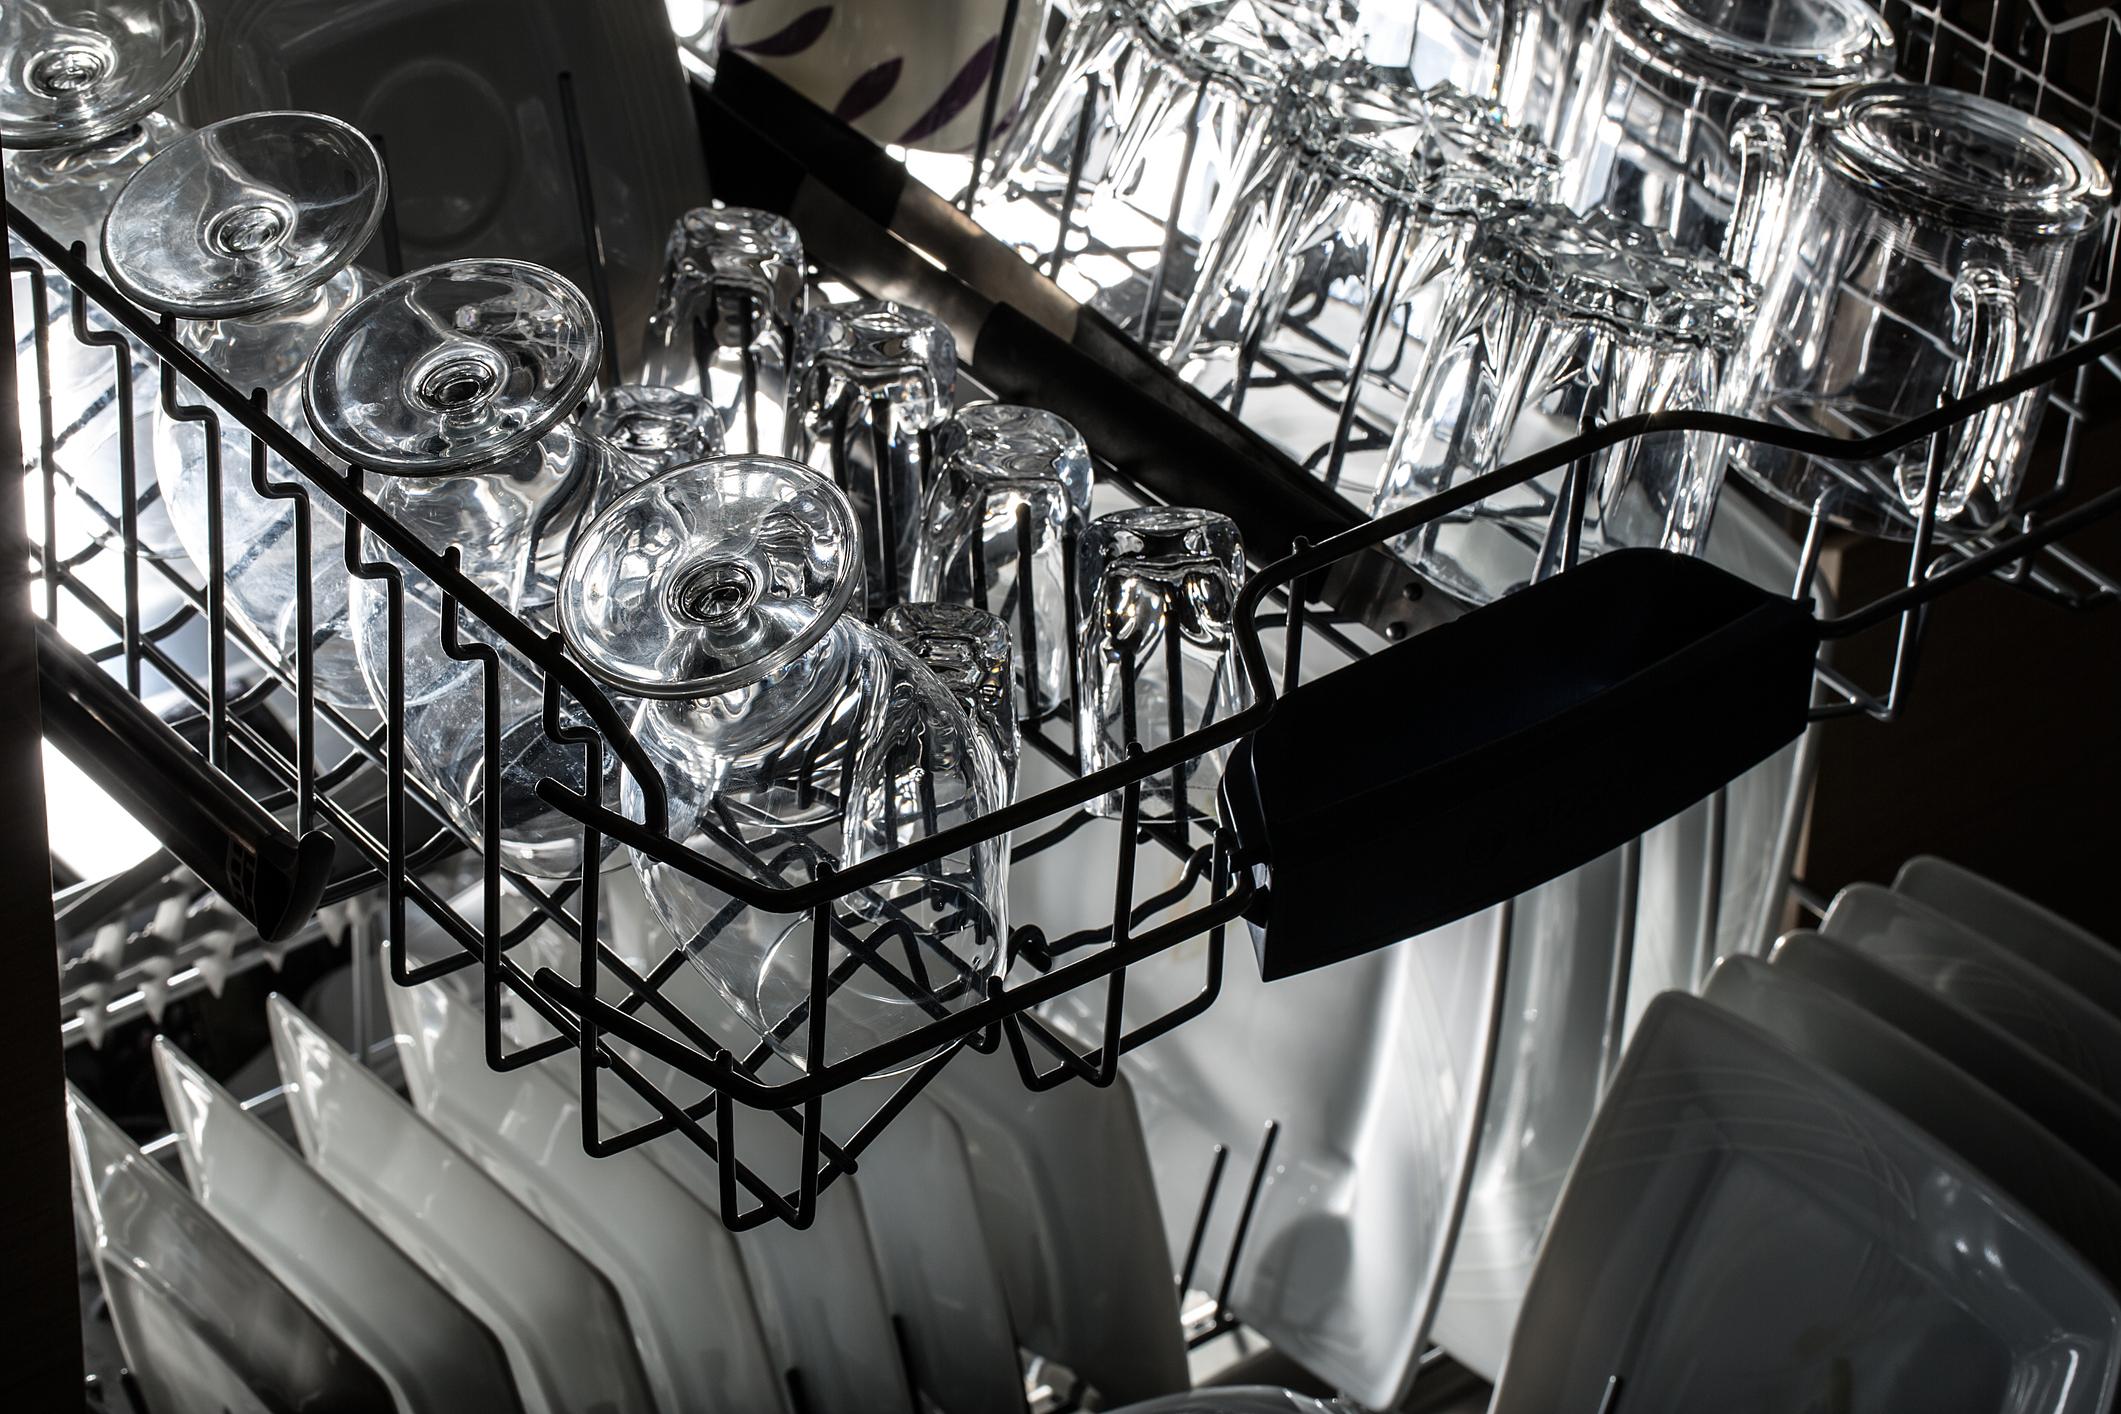 Spülmaschine Gläser Geschirr reinigen Anleitung